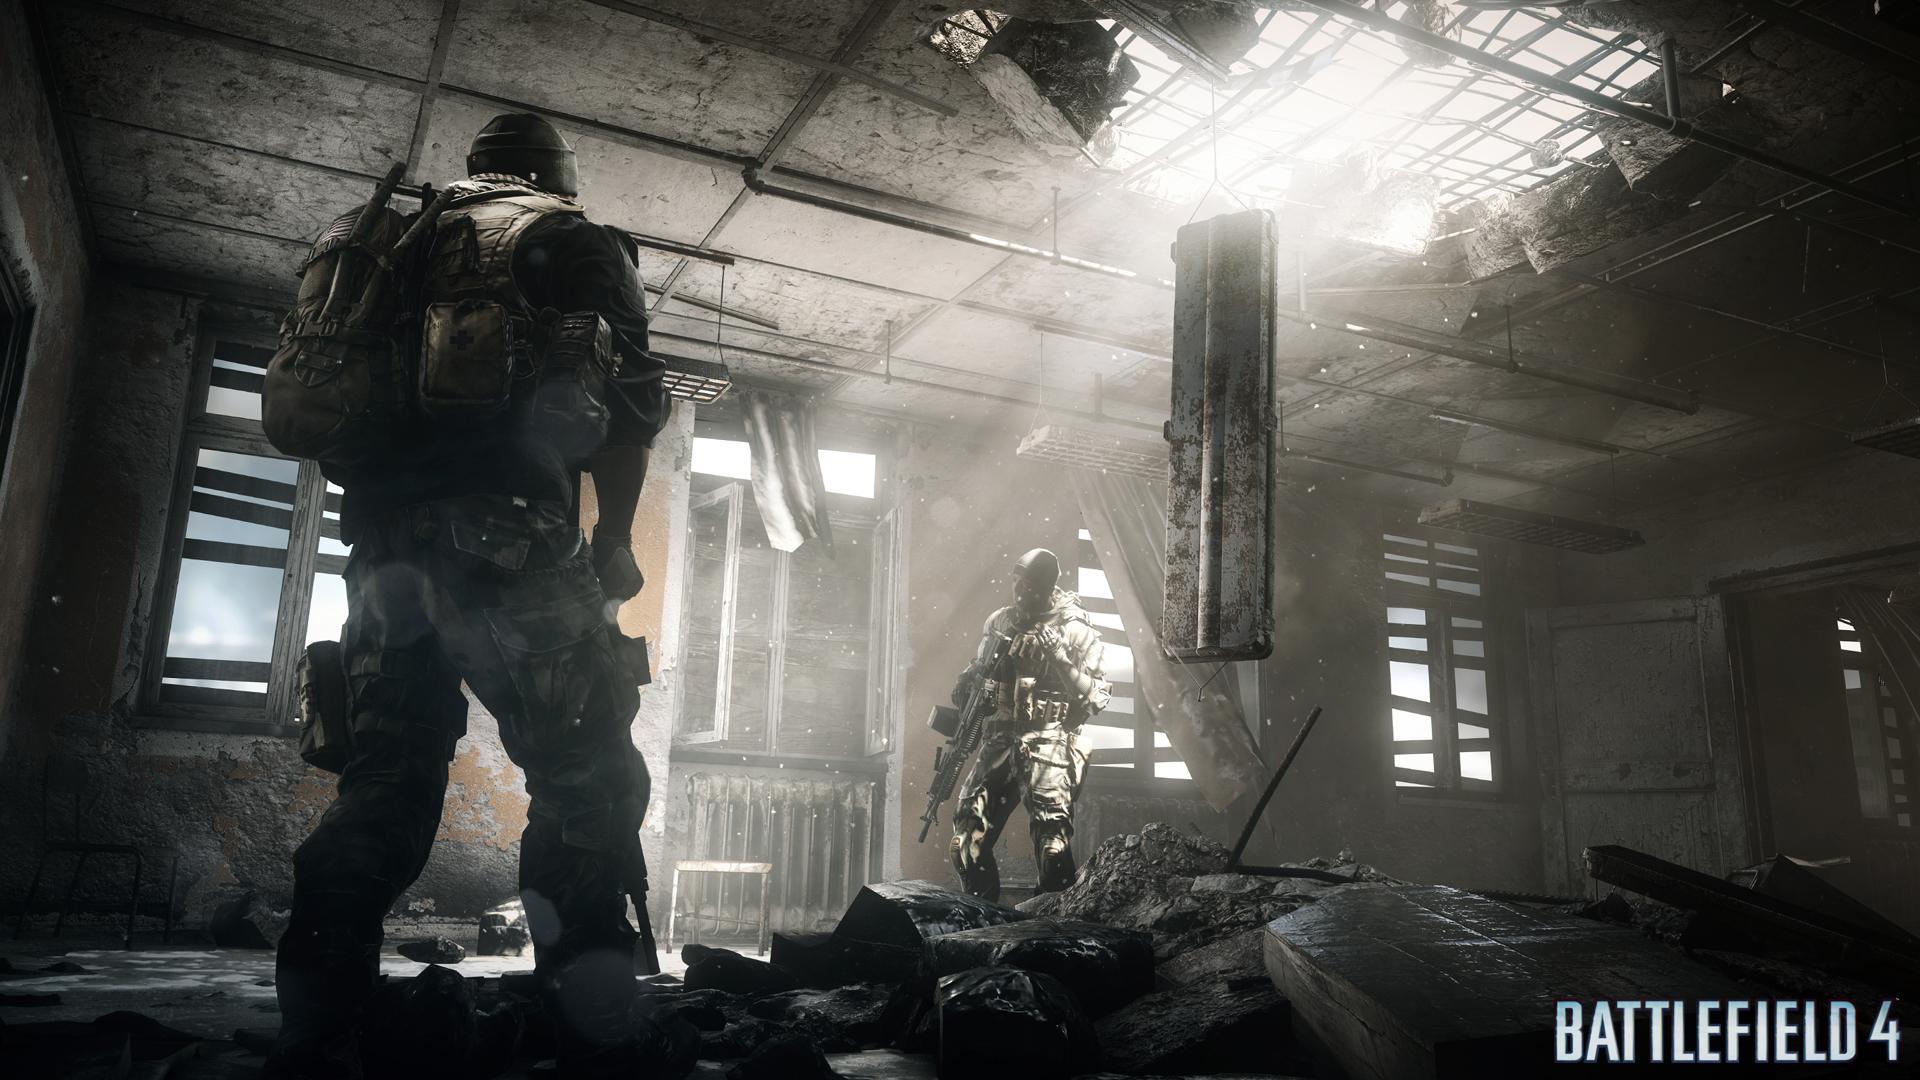 Battlefield 4 wallpaper 17